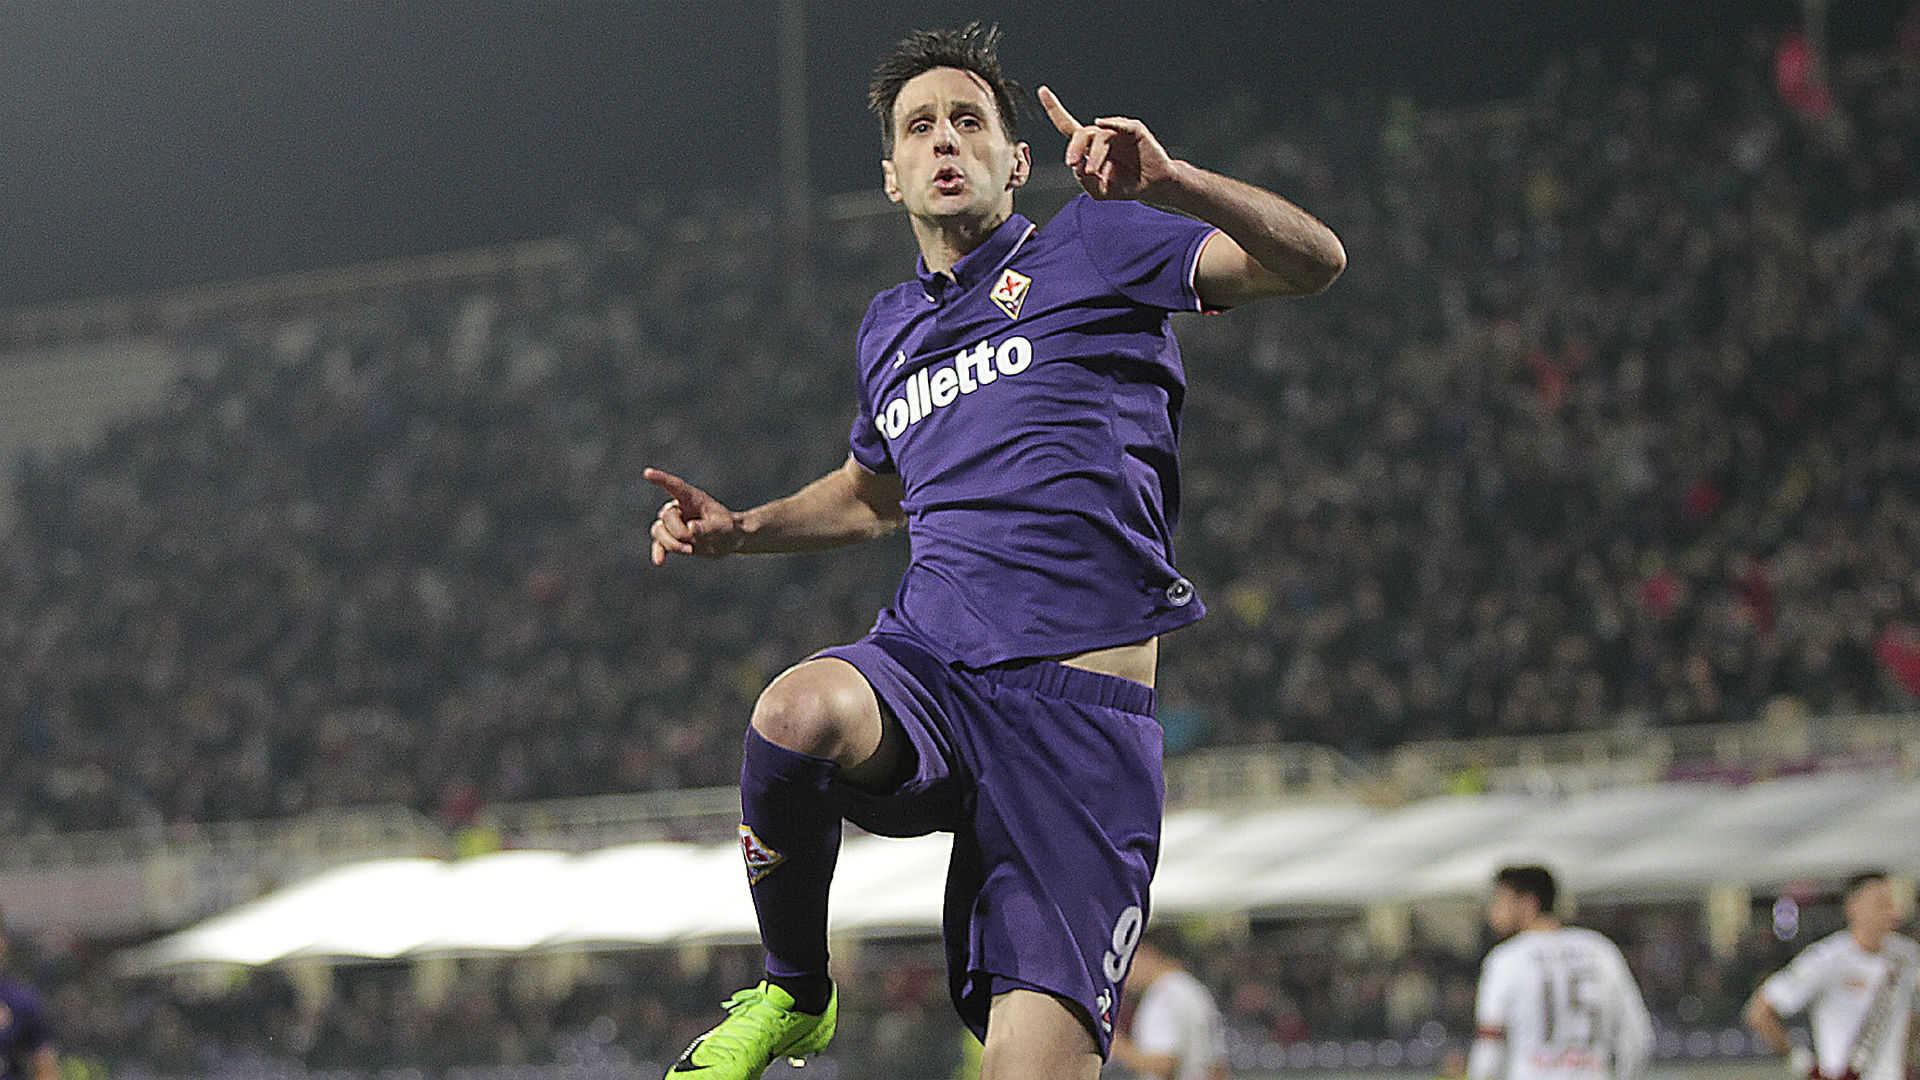 Calciomercato Milan, Kalinic e non solo: tre colpi rossoneri 2148 26-06